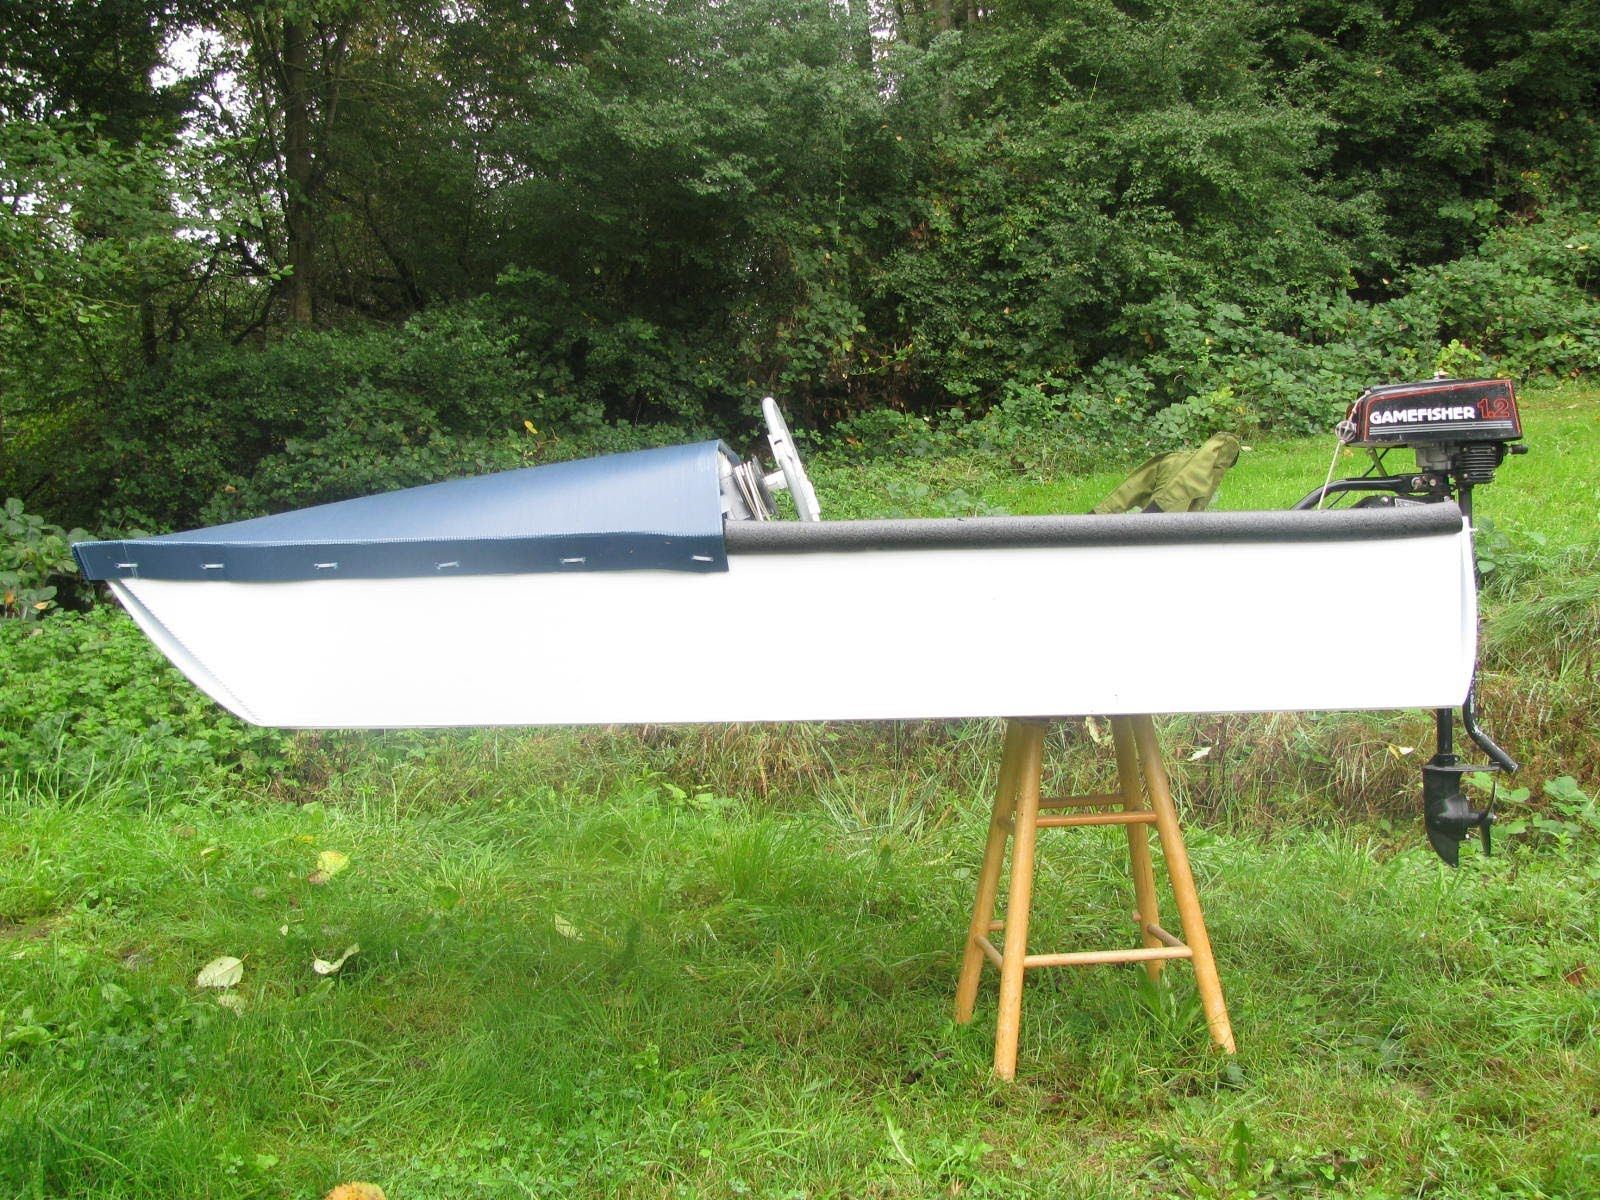 1 Sheet Coroplast Motorboat Wood Boat Plans Wooden Boat Building Wooden Boat Plans